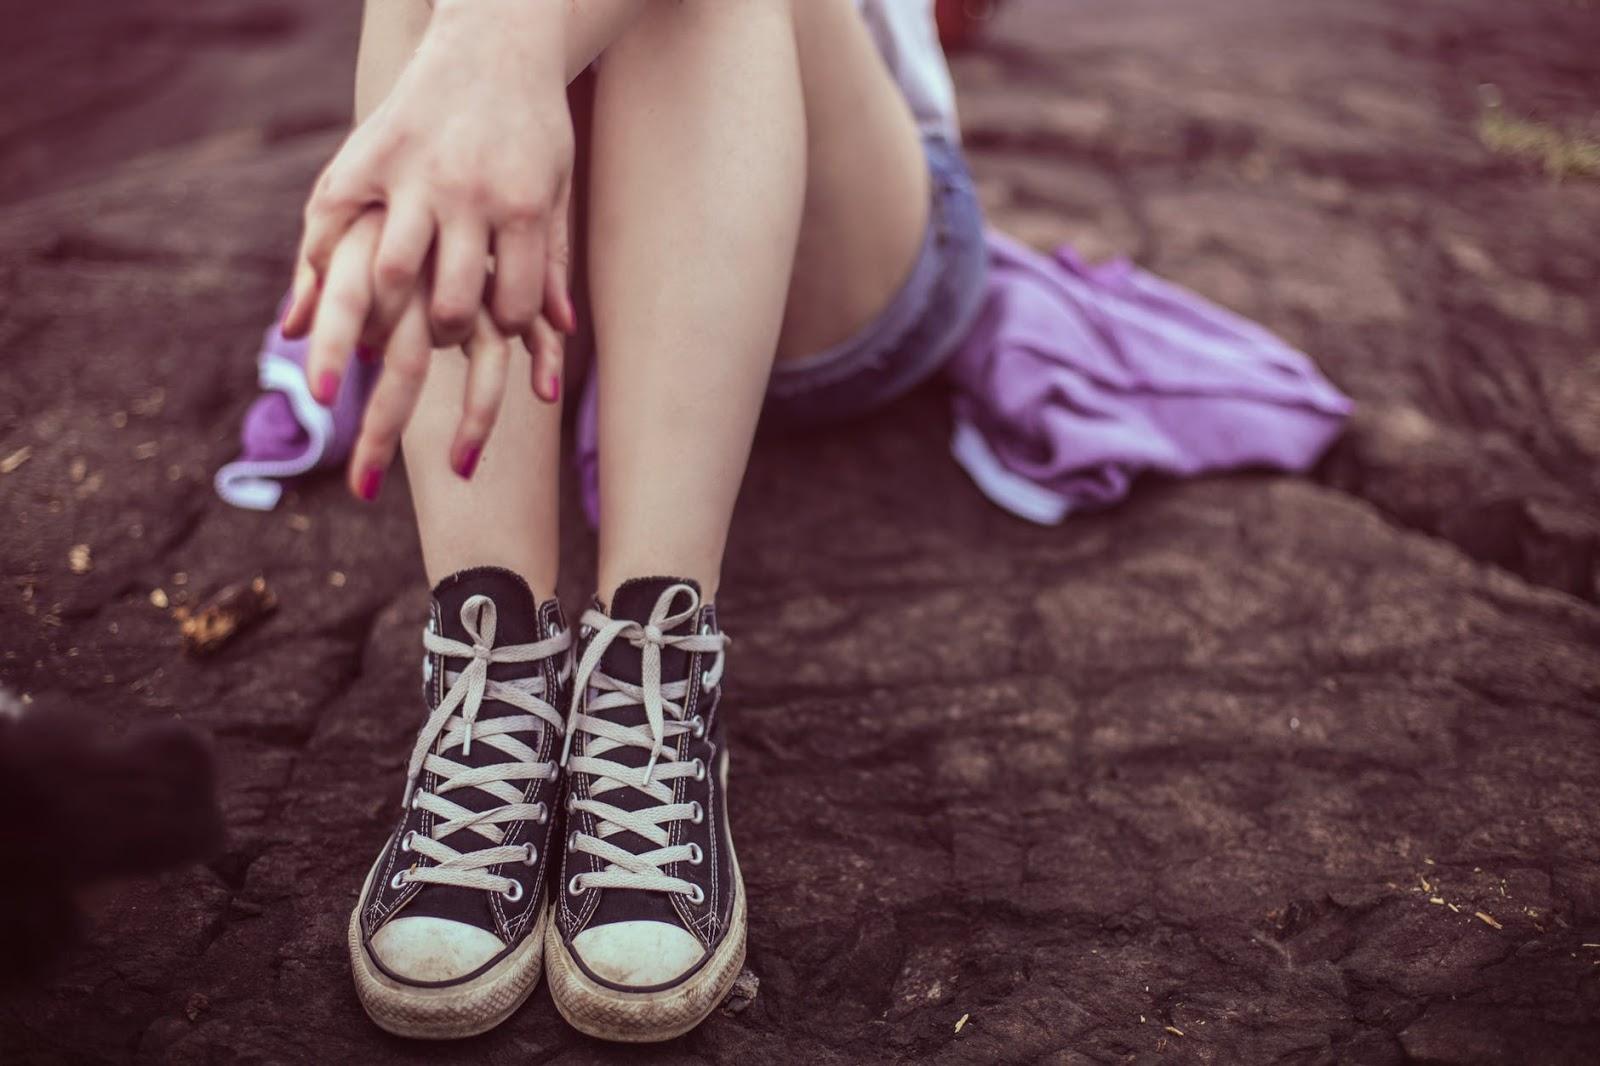 teenager wearing shorts and converse